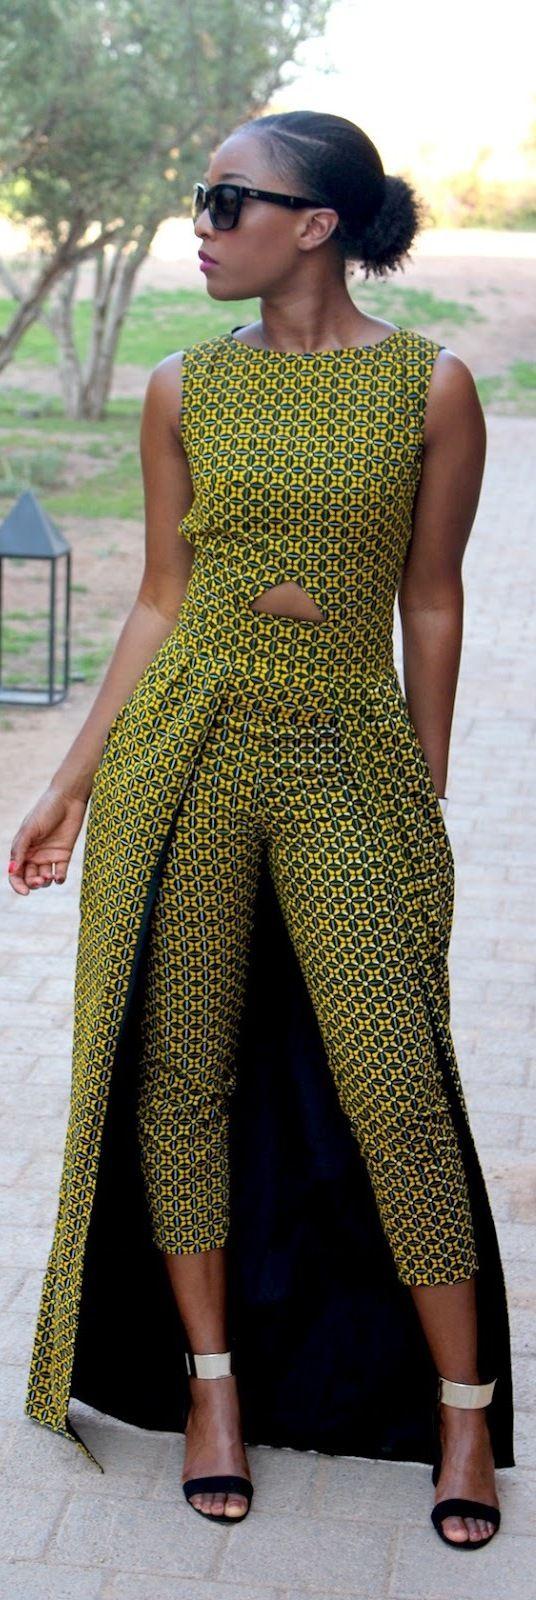 Natacha Baco / Fashion By M'bem Di Fora